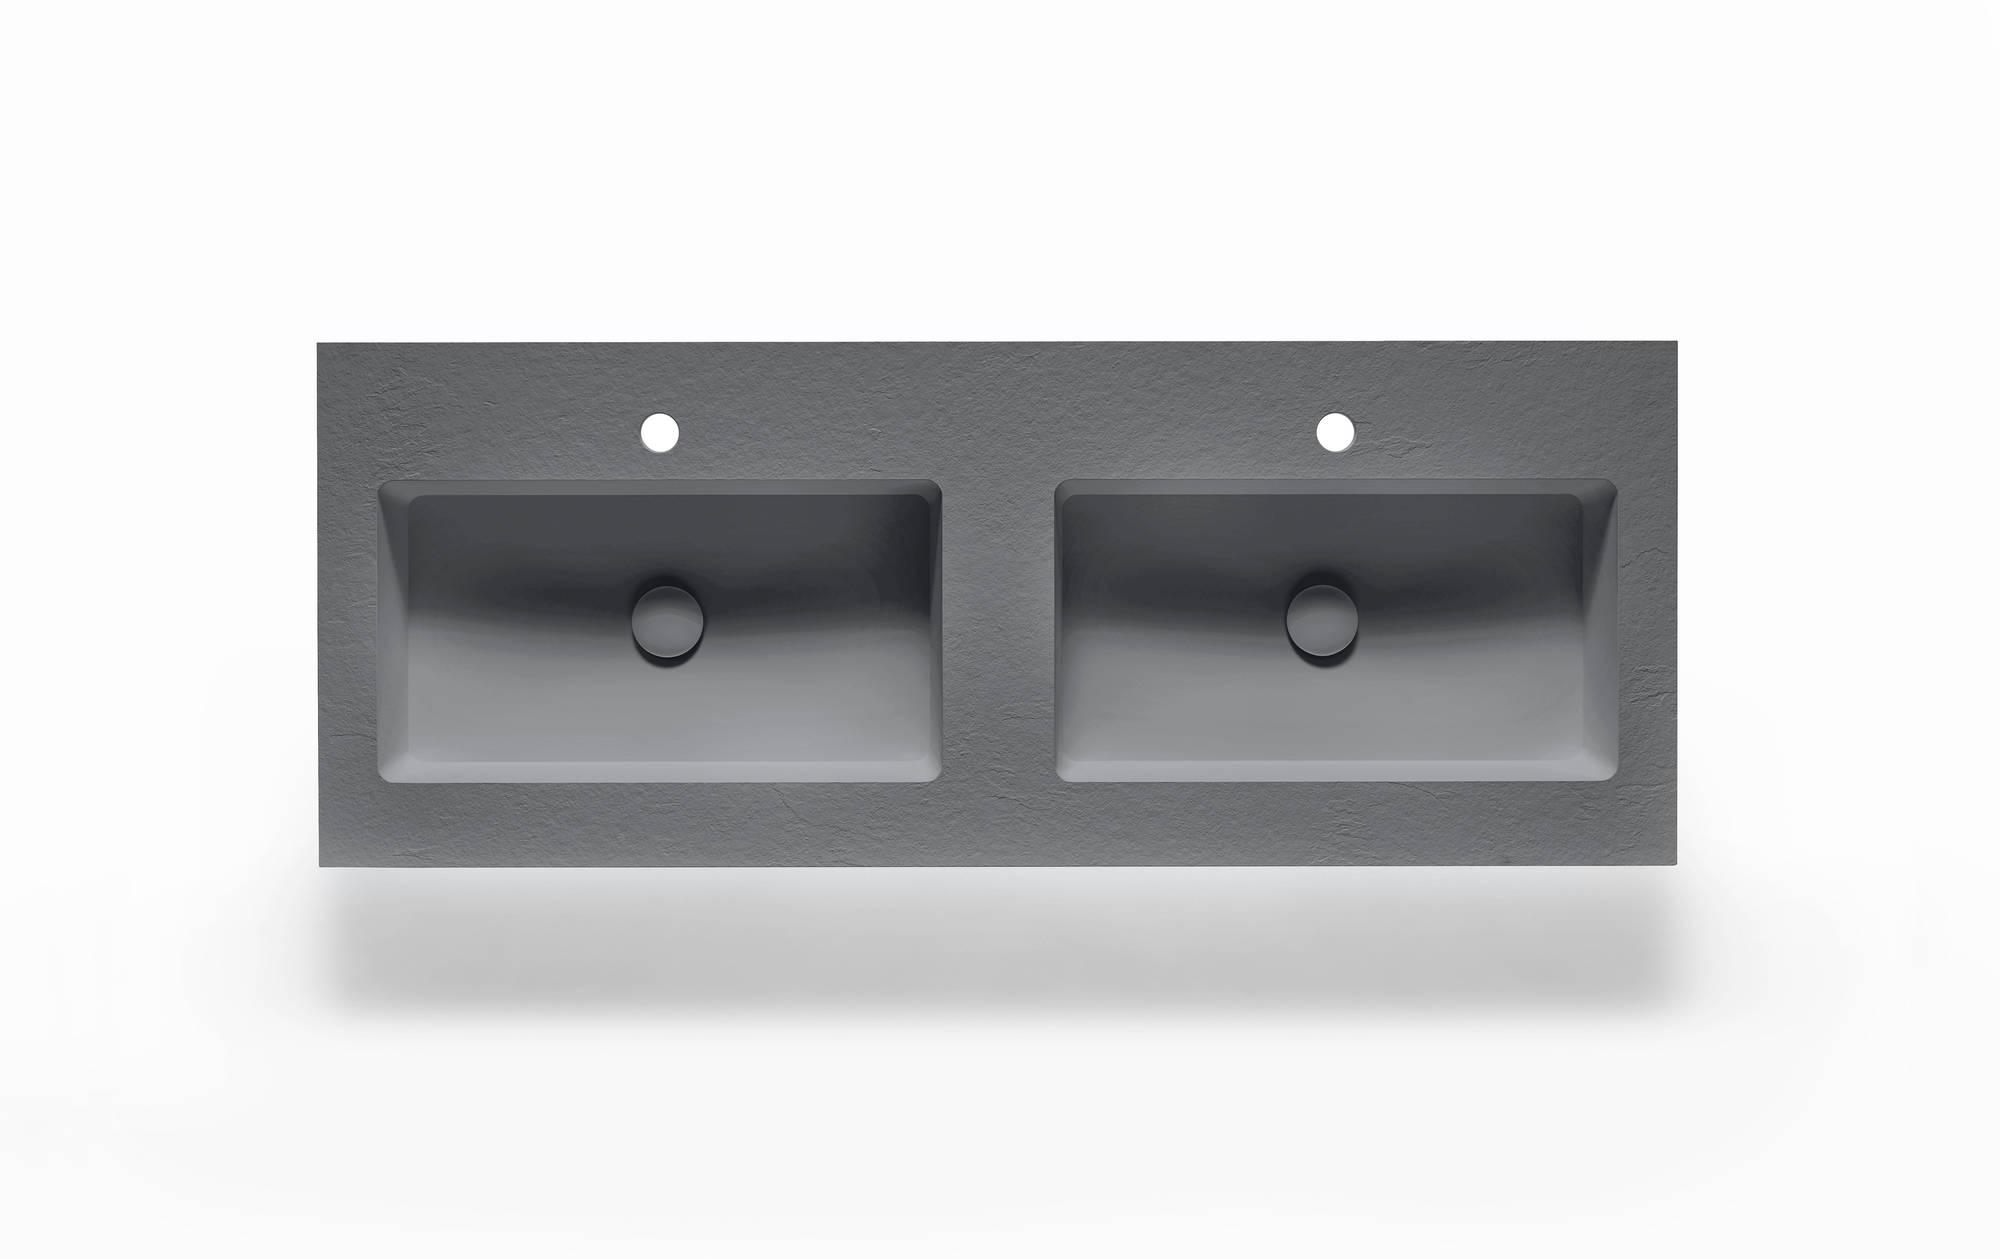 Ben Avira A1 Wastafel Akron 120,3x45x1,3 cm Cemento